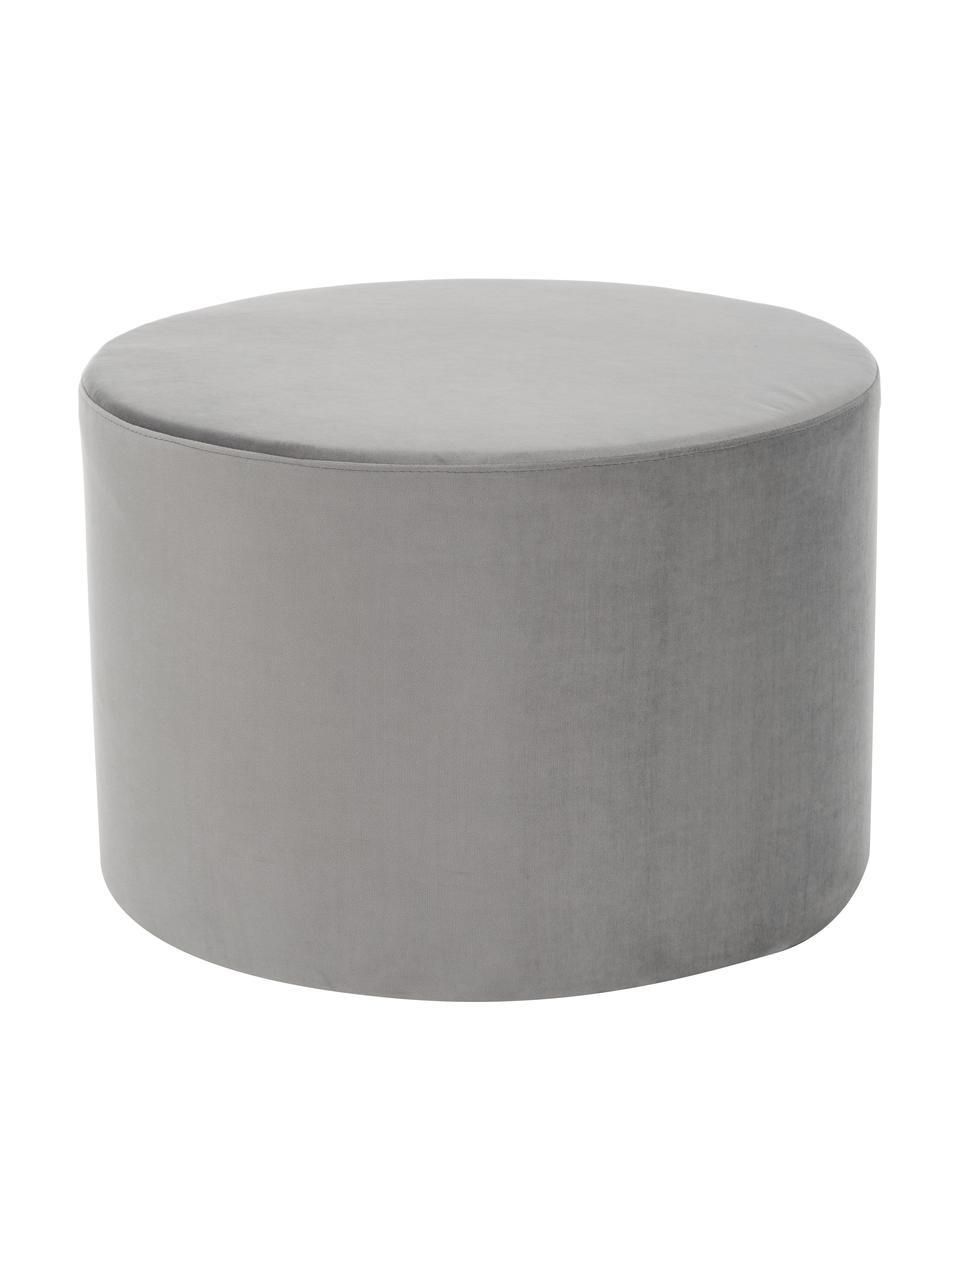 Samt-Hocker Daisy, Bezug: Samt (Polyester) Der hoch, Rahmen: Sperrholz, Samt Grau, Ø 54 x H 38 cm